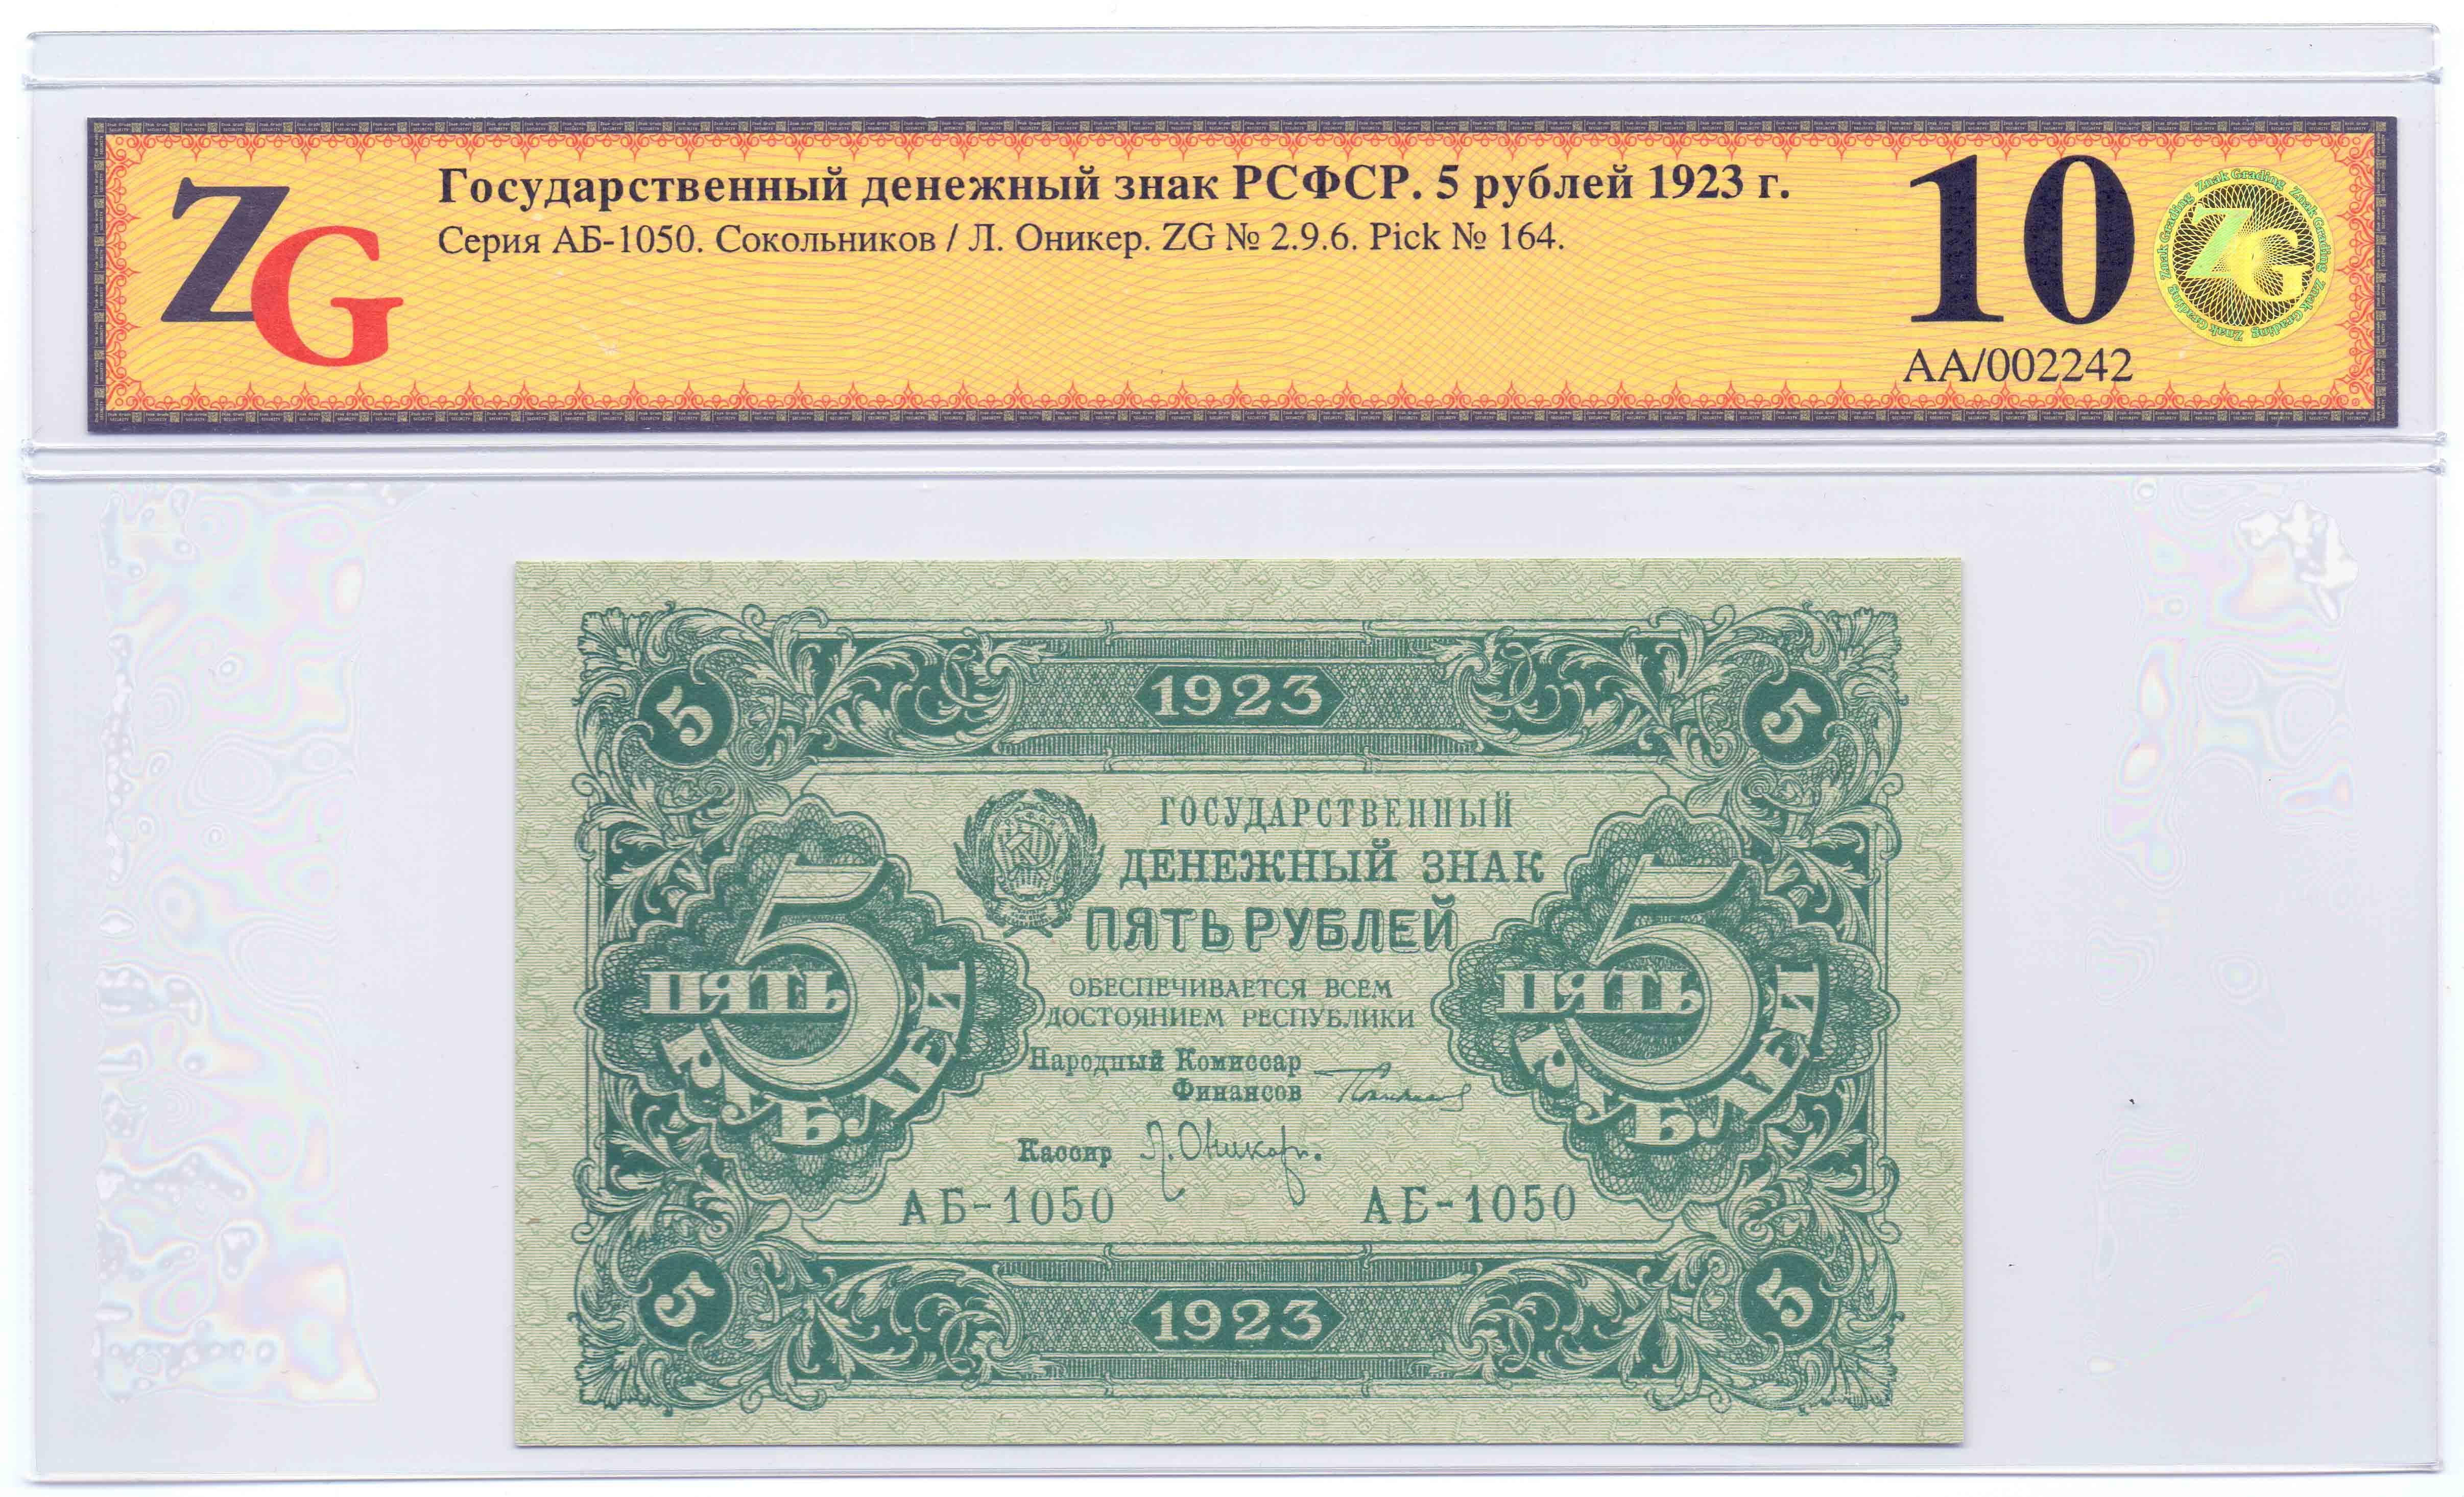 5 рублей  1923 г. АБ-1055 ZG № 2.9.6. 65 GUnc Pick.164